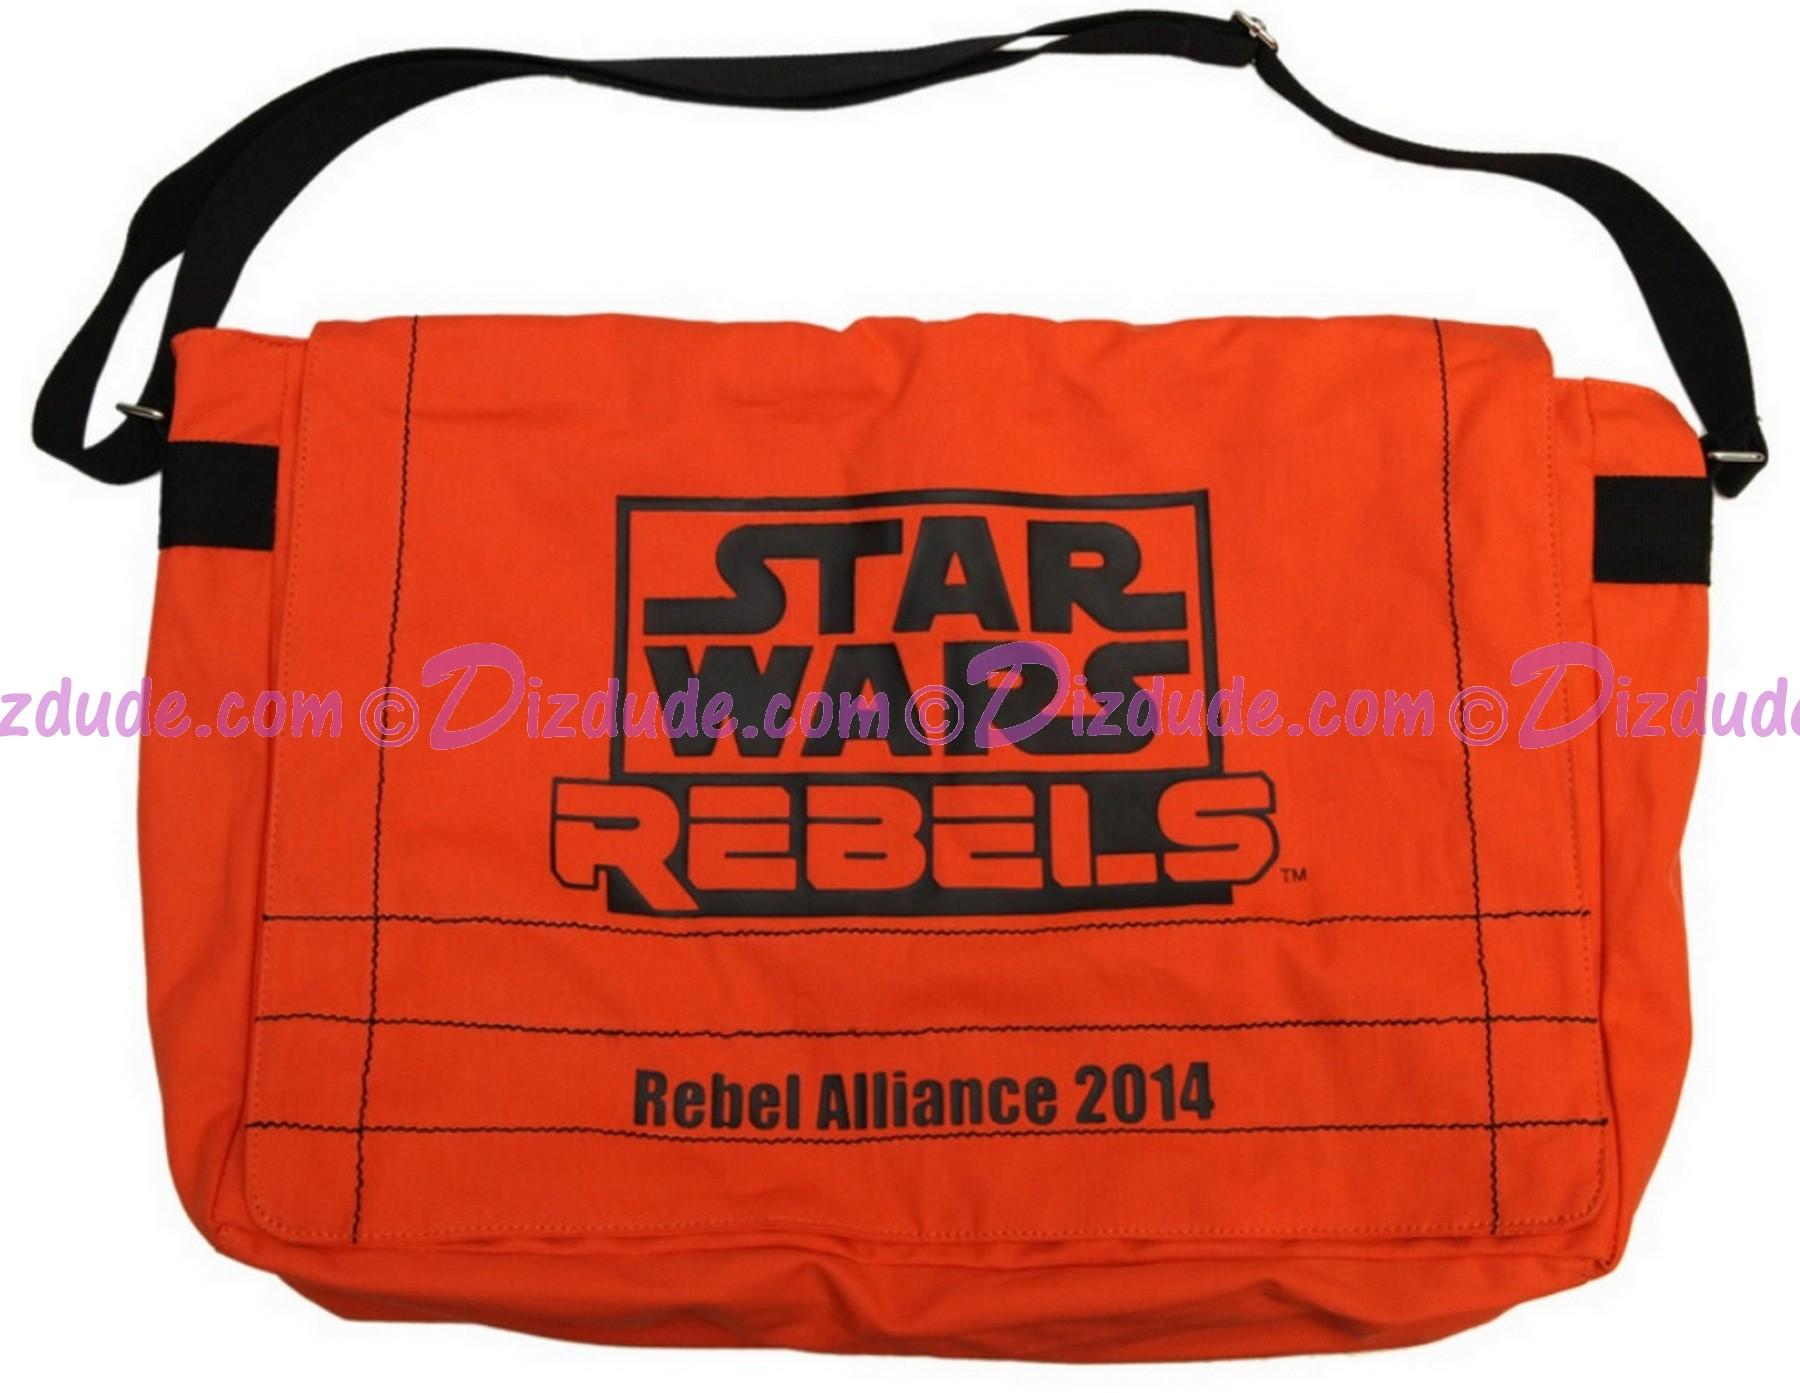 Star Wars REBELS Recruitment event attendee Pack Limited Edition messanger bag - Disney Star Wars Weekends 2014 ~ © Dizdude.com